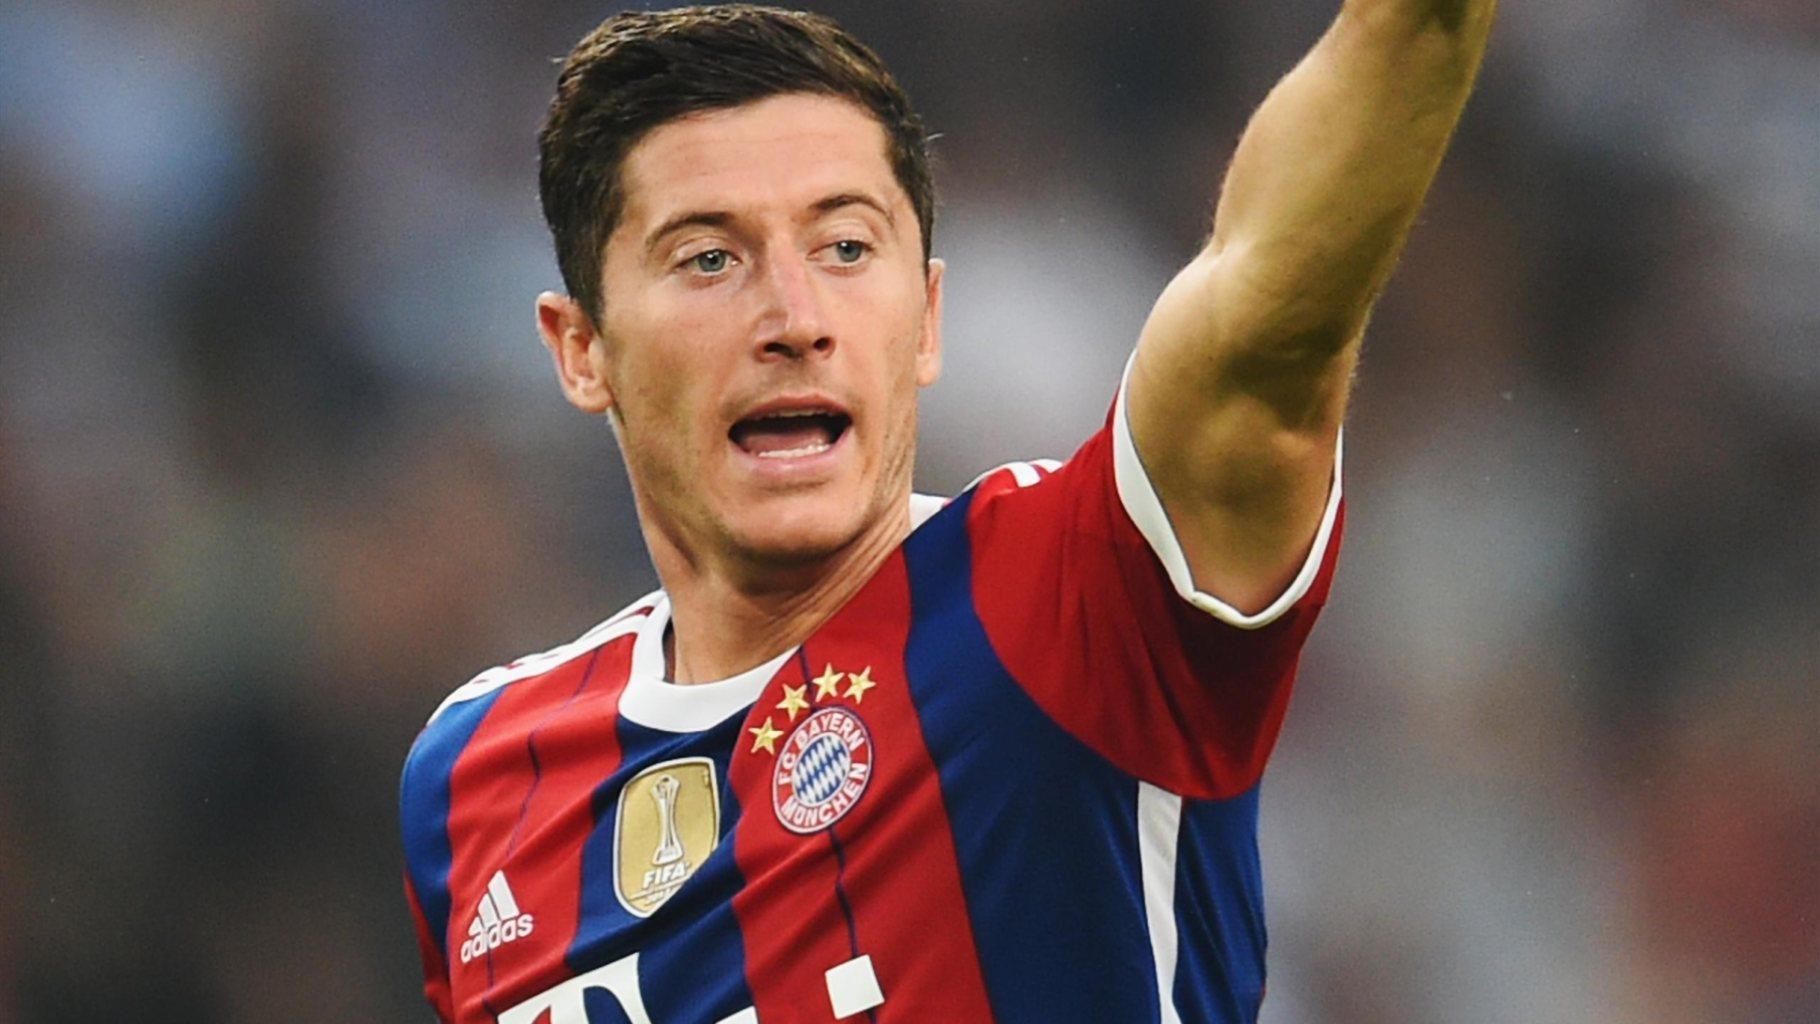 Image Robert Lewandowski Bundesliga Wiki